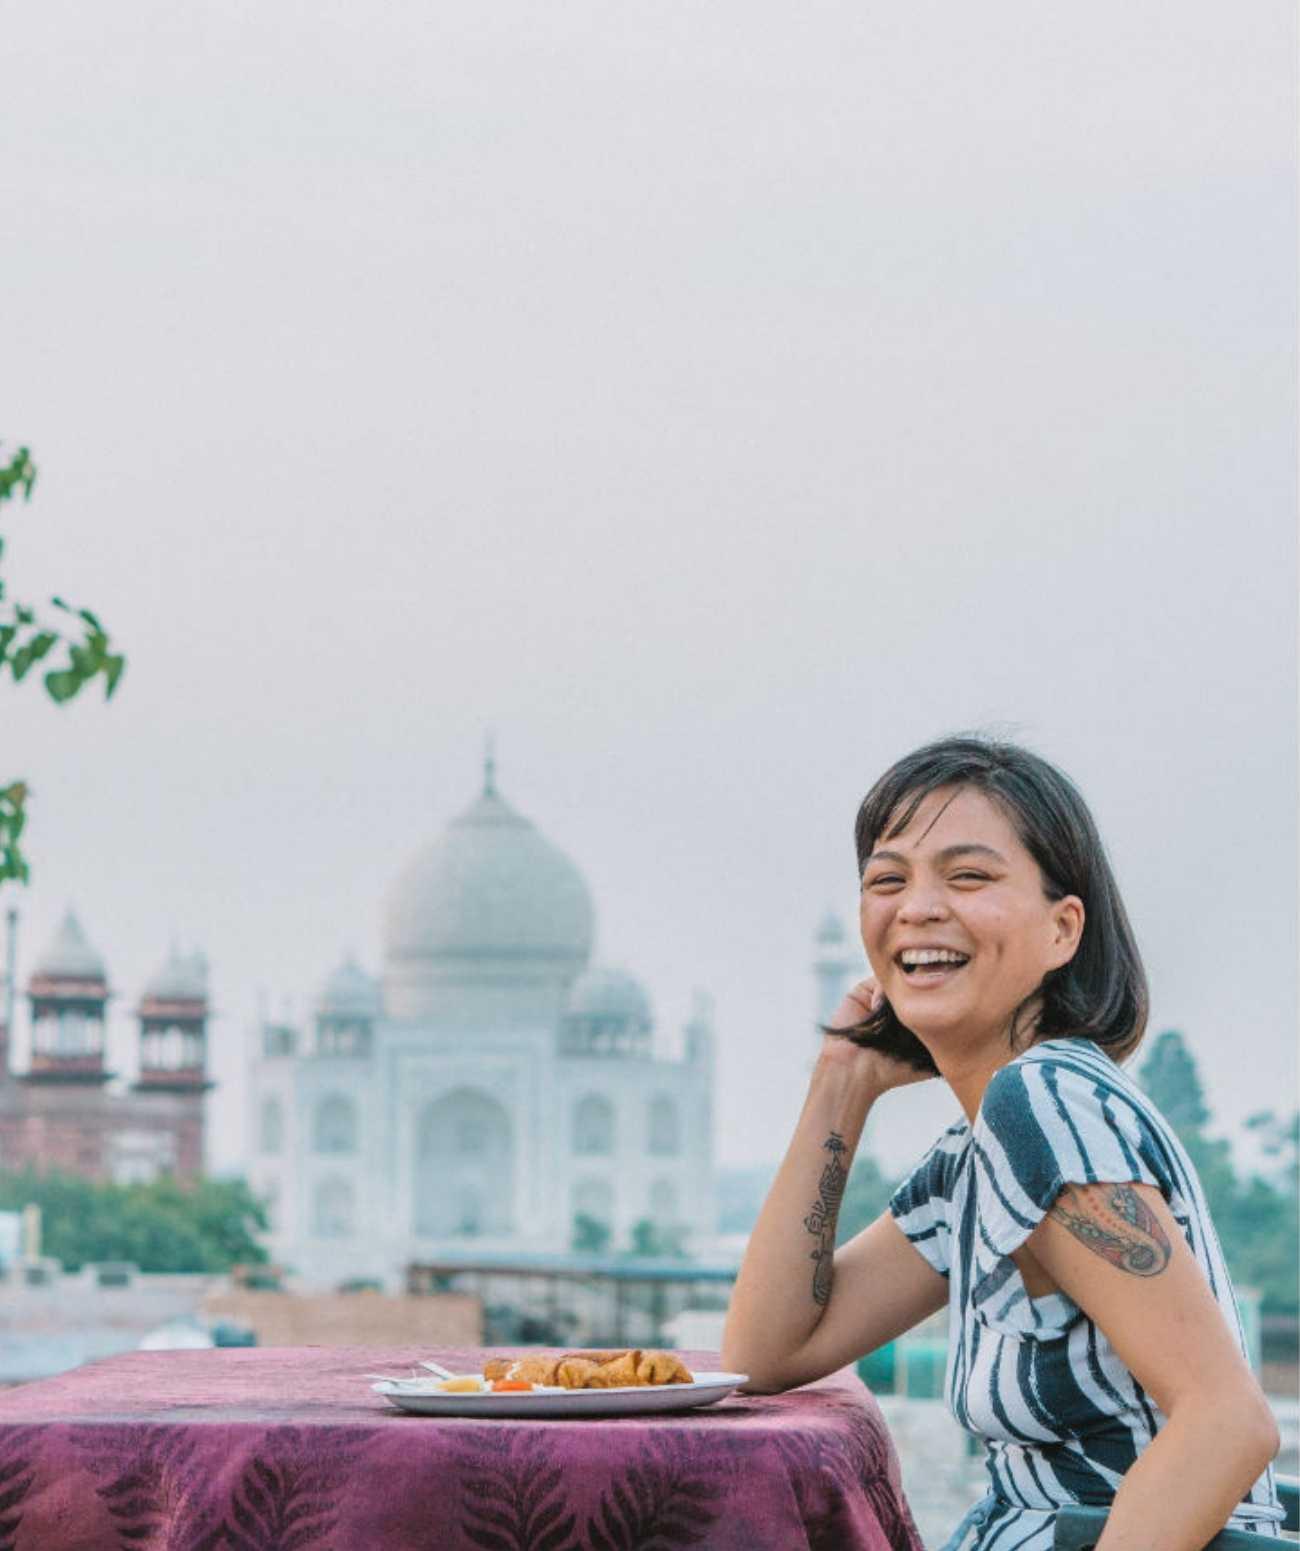 restaurants with taj mahal view